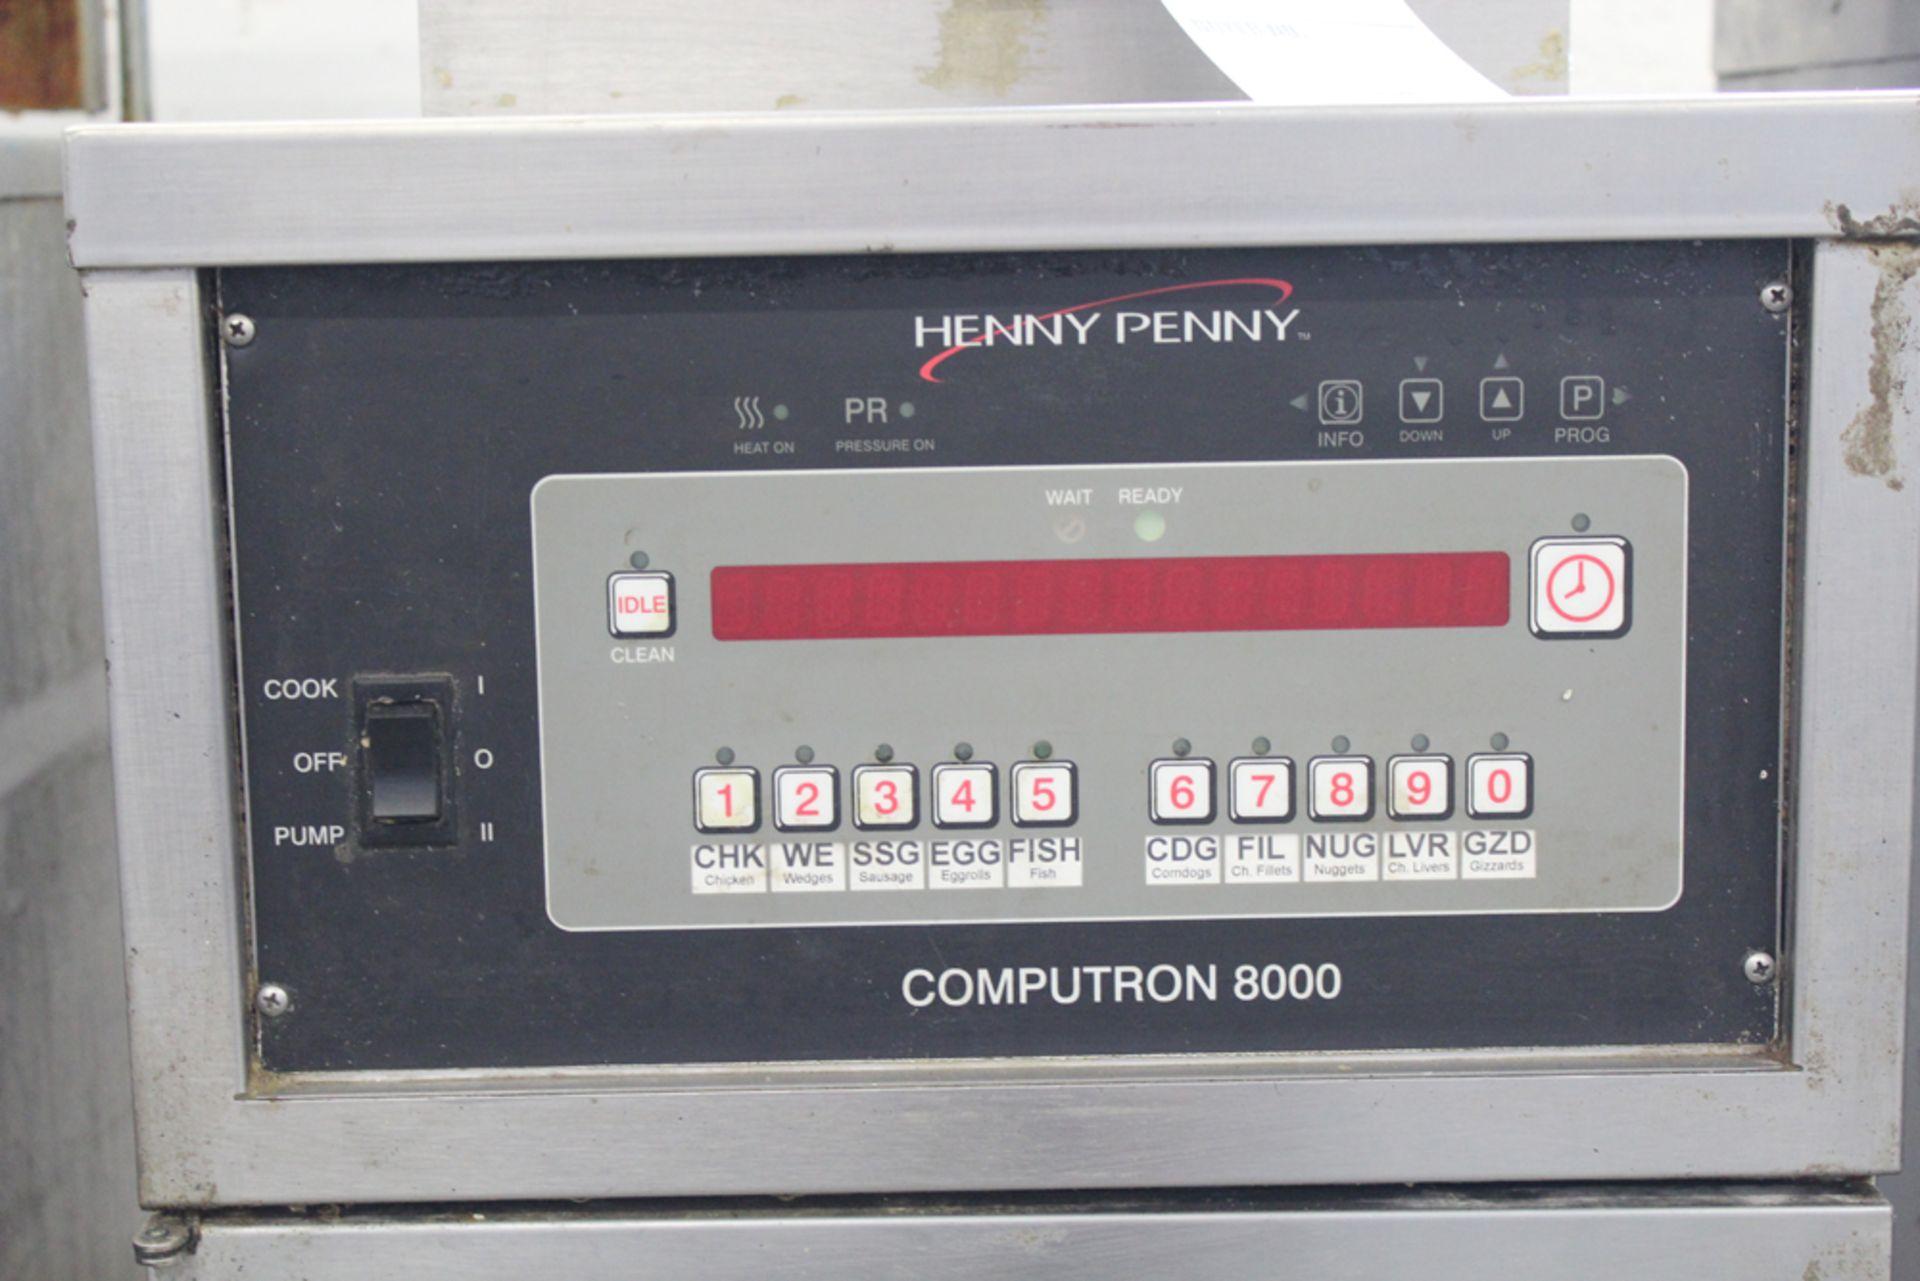 Lot 8 - Henny Penny computron 8000 gas